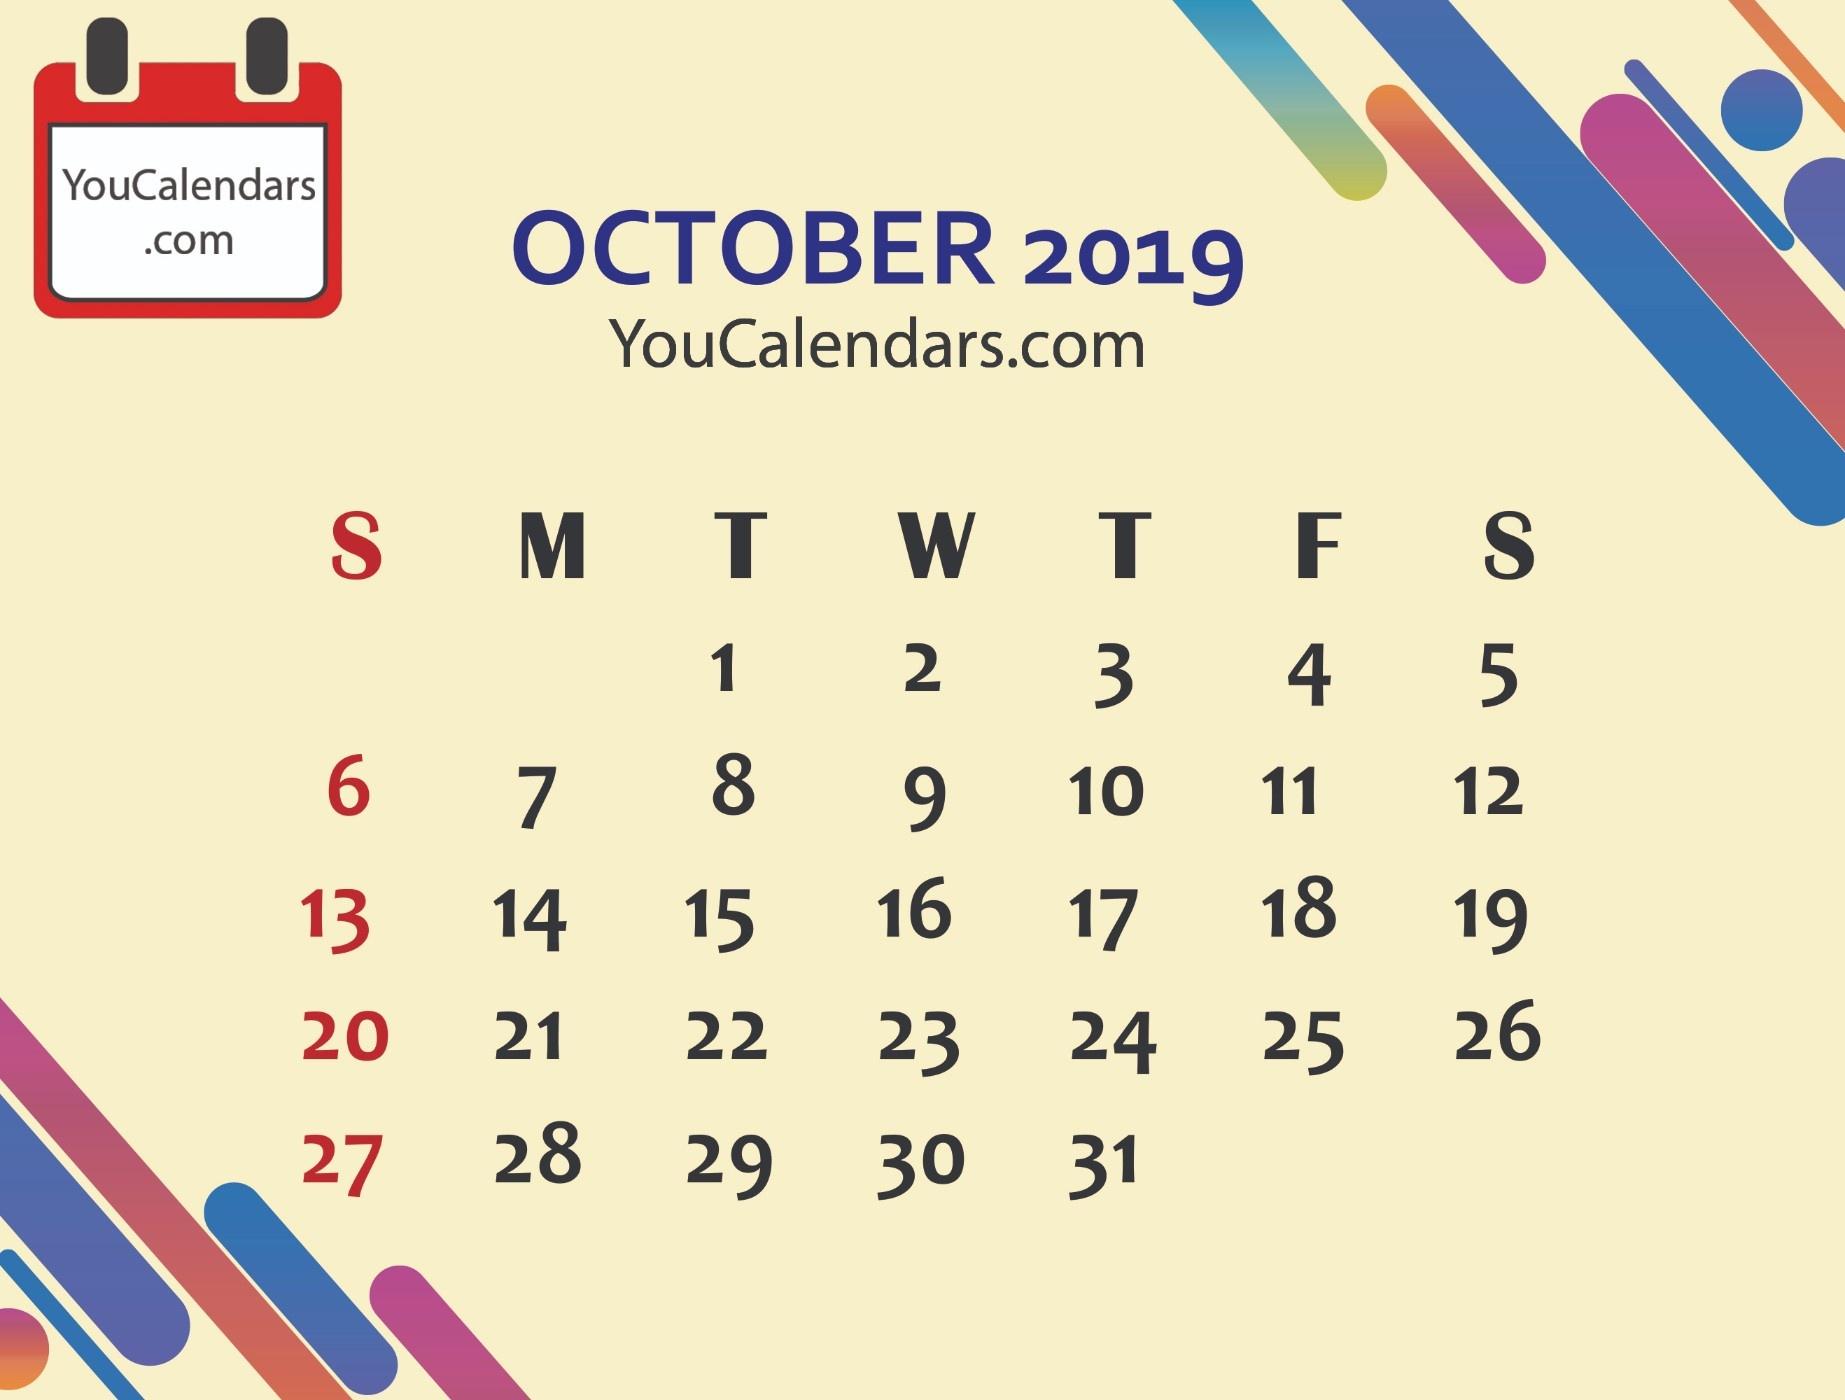 ✅Free October 2019 Calendar Printable Template - You Calendars - Free October Printables